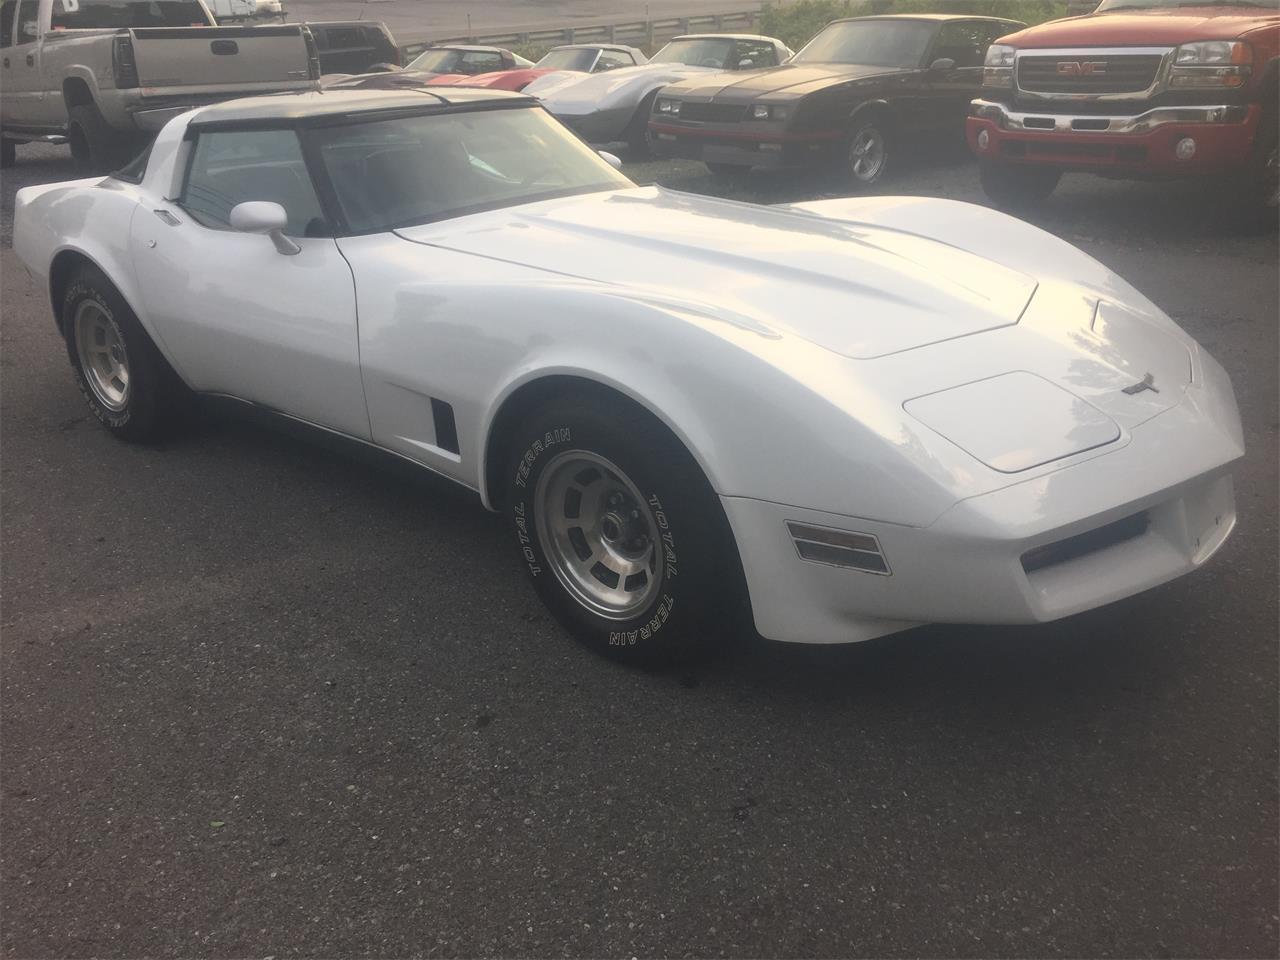 1980 Chevrolet Corvette (CC-1388115) for sale in Mount Union, Pennsylvania